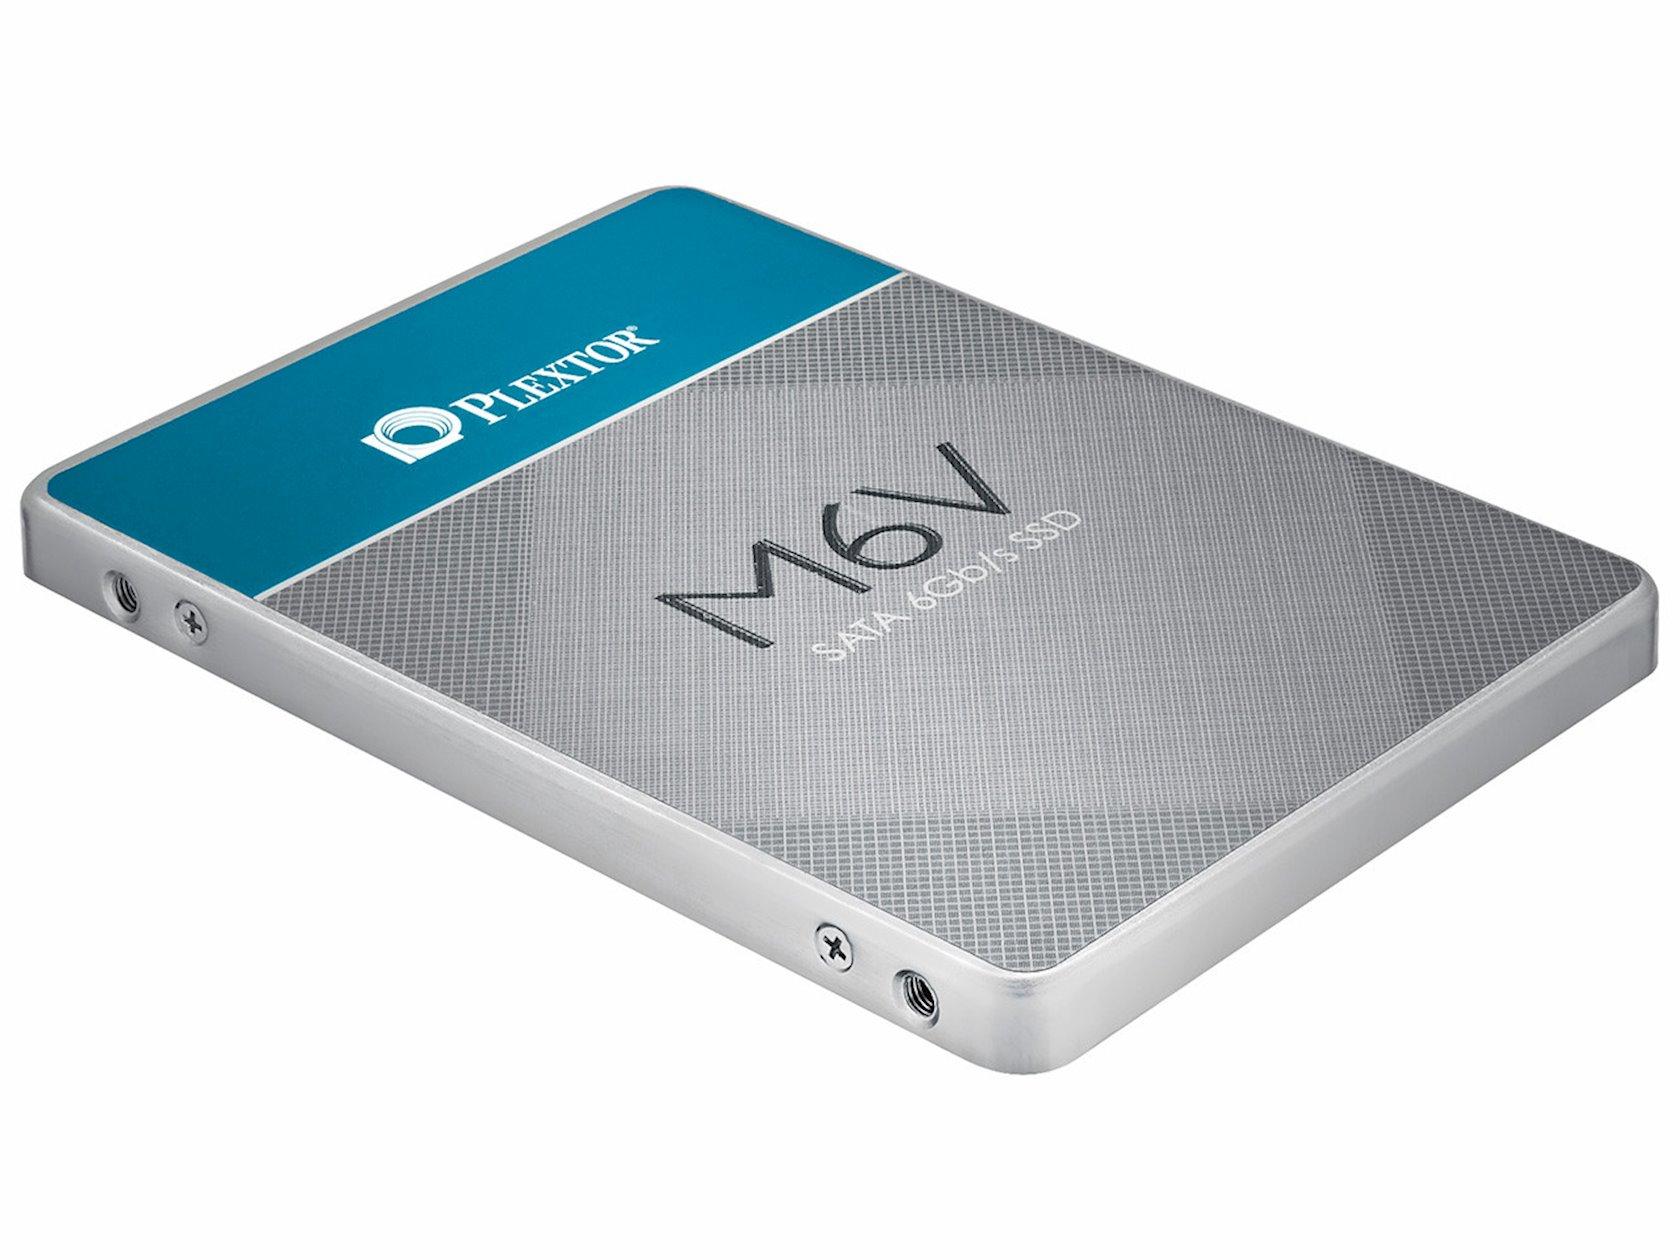 Daxili SSD Plextor M6V 512 GB